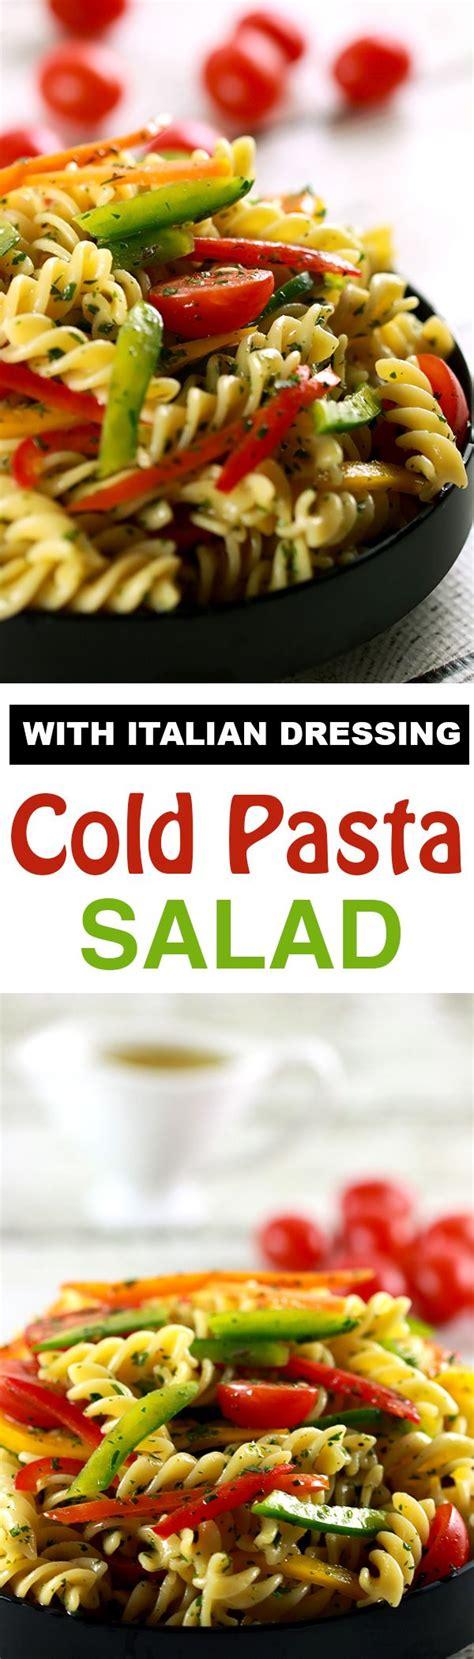 cold pasta cold pasta salad recipes bacon ranch pasta salad recipe